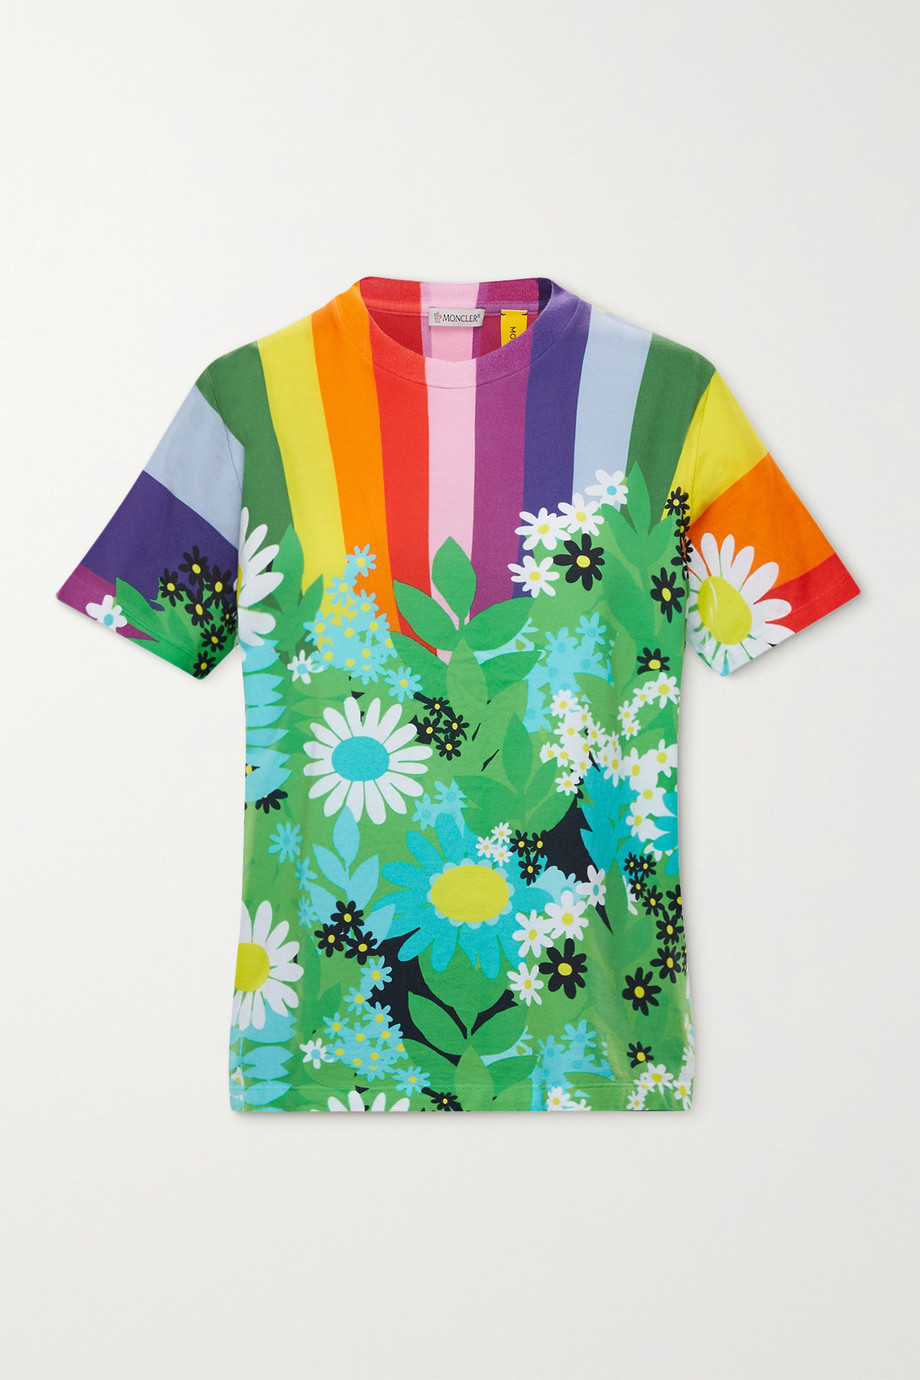 Moncler Genius + 8 Richard Quinn printed cotton T-shirt